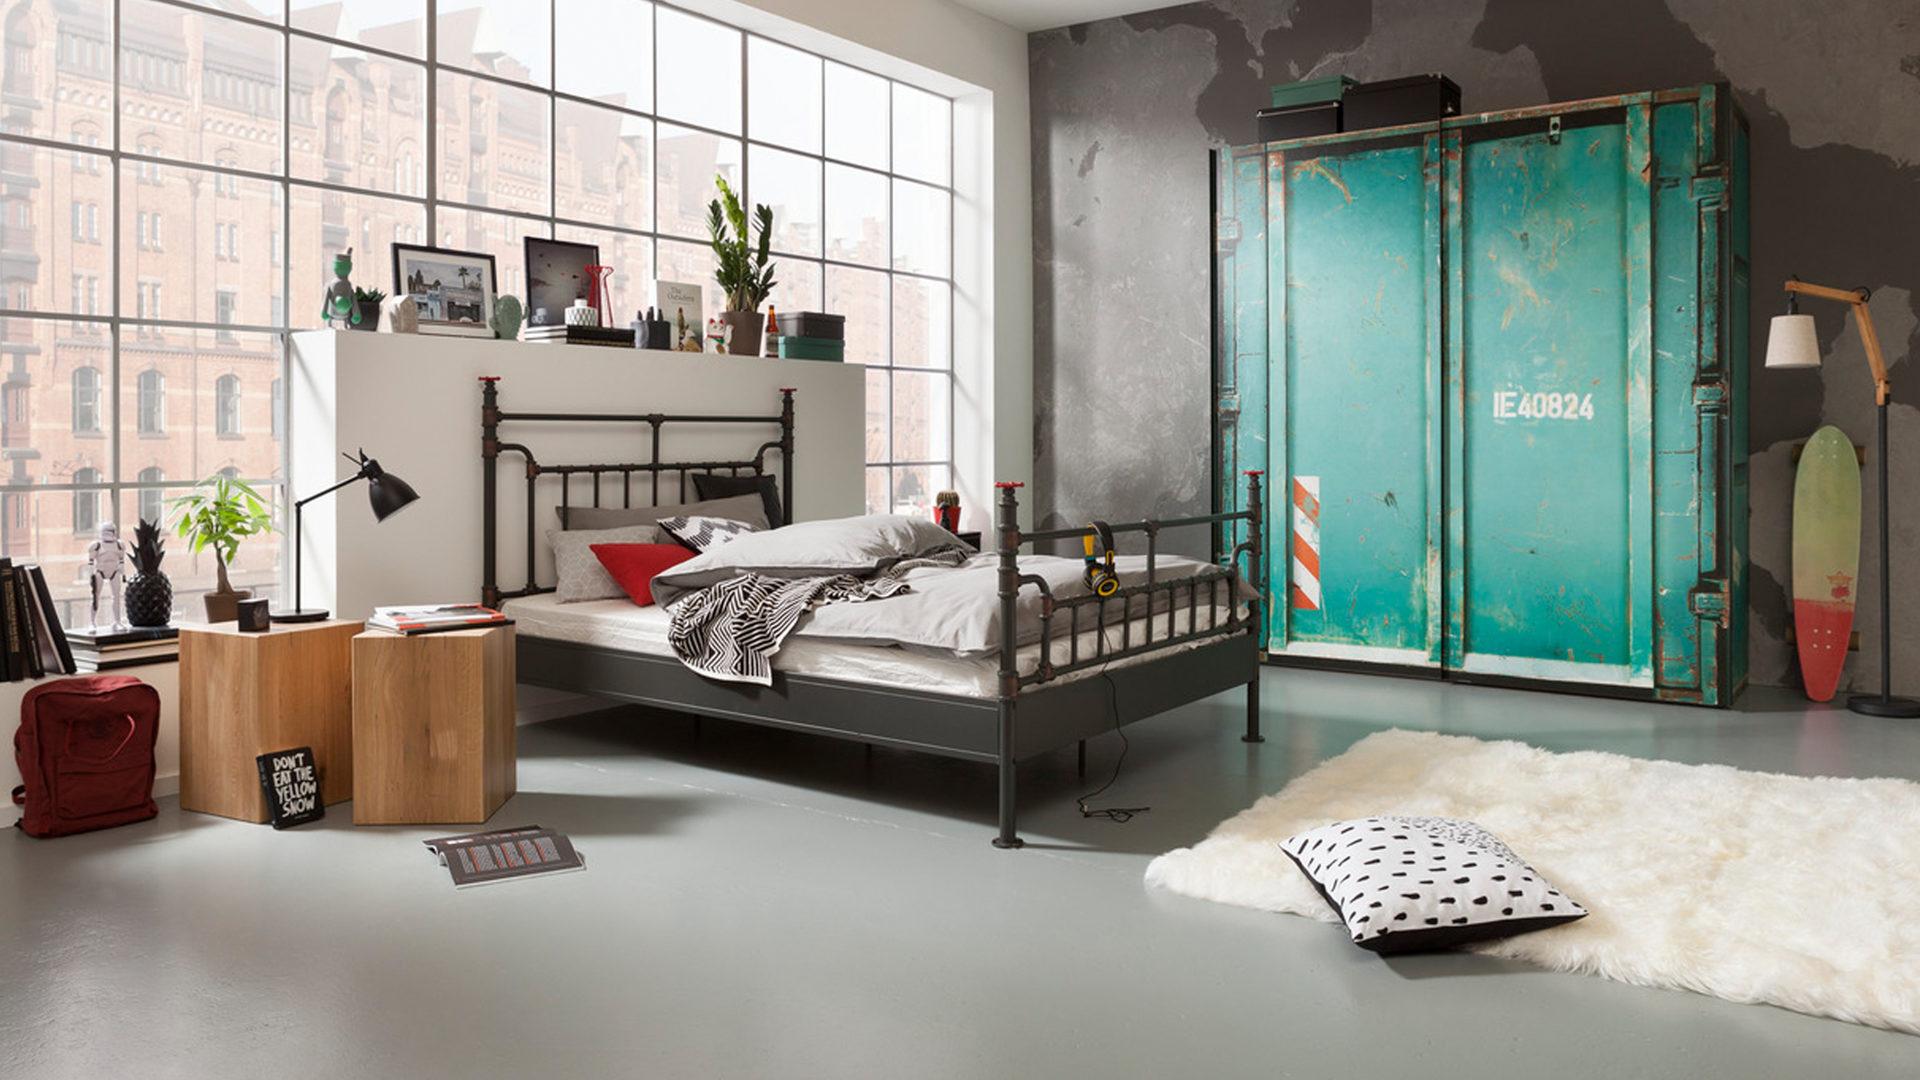 Hertel Möbel e.K. Gesees, Räume, Jugendzimmer + Kinderzimmer ...